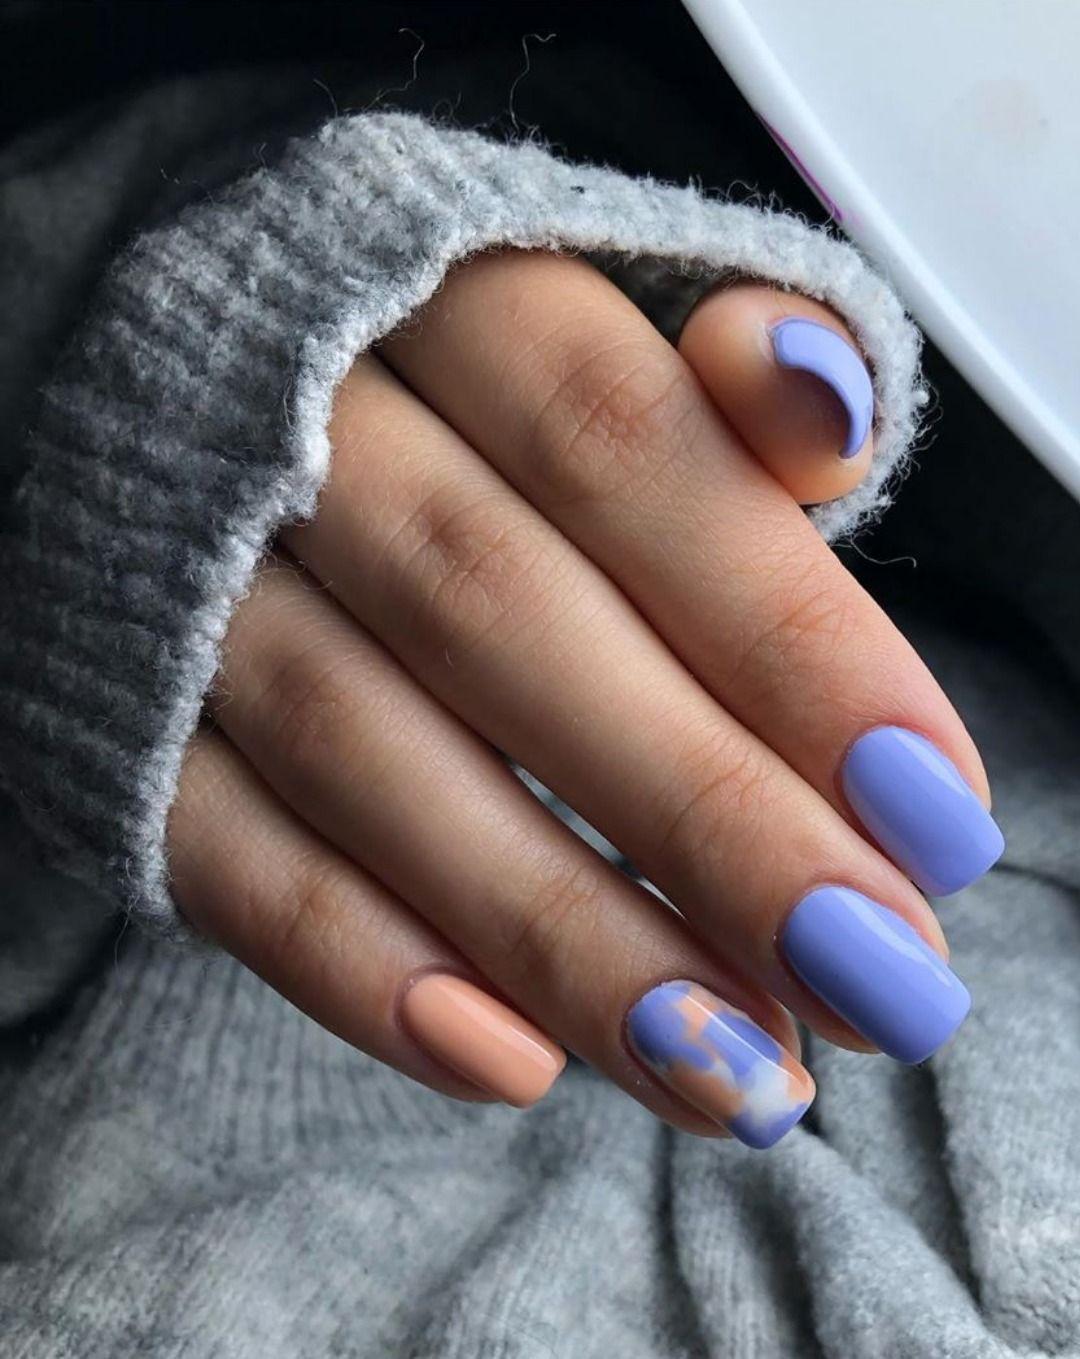 So Cute Short Acrylic Nails Ideas You Will Love Them Short Acrylic Nails Purple Nail Designs Shiny Nails Designs